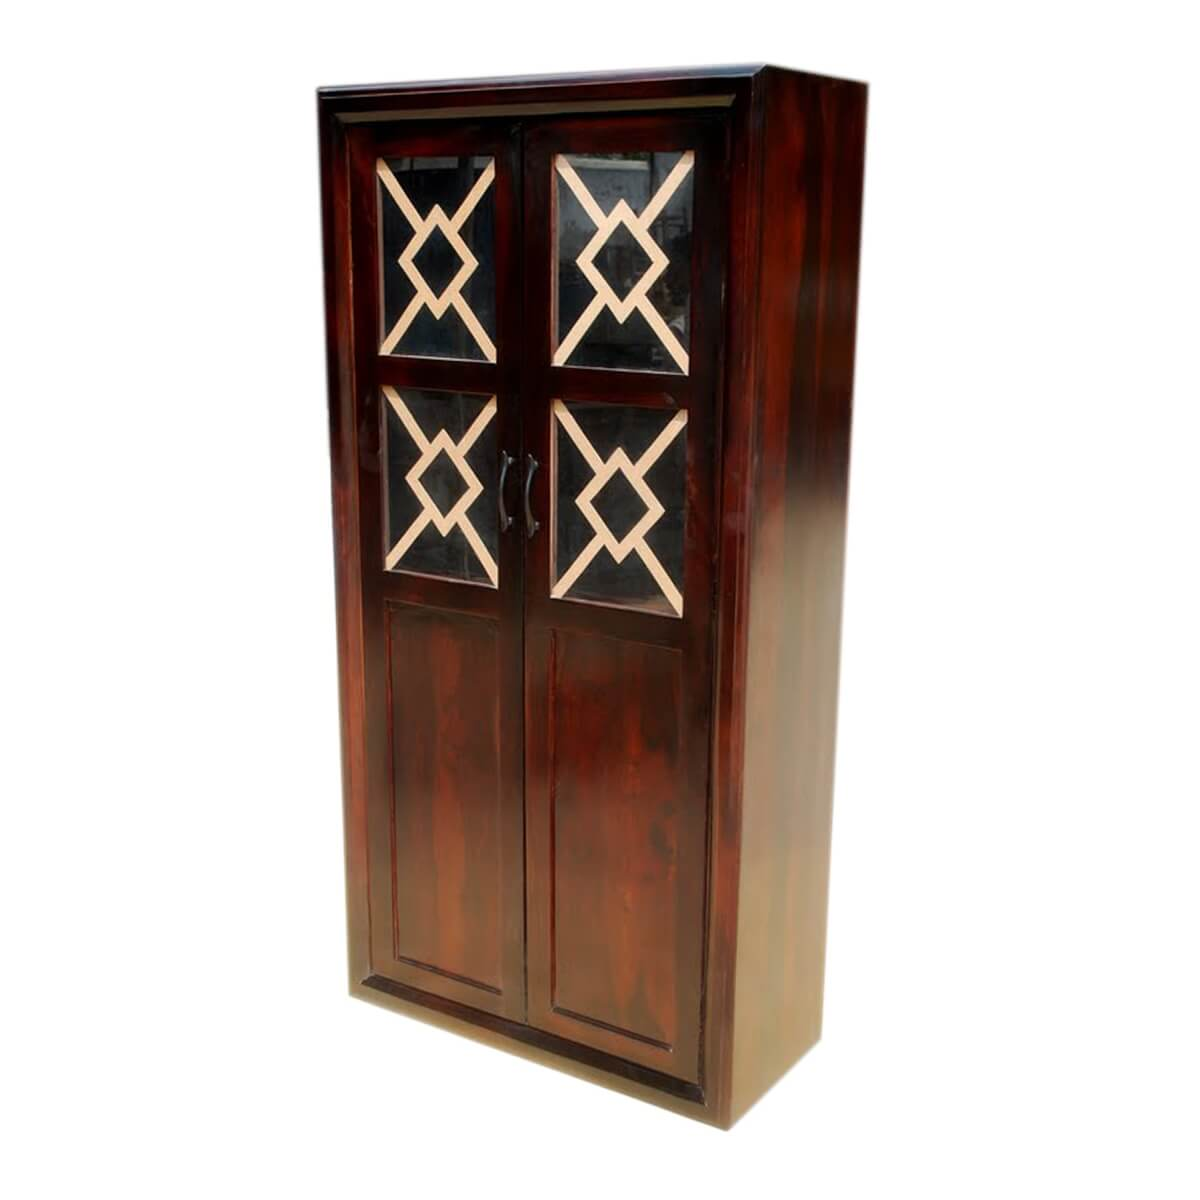 Solid Wood Glass Doors Armoire Wardrobe Furniture